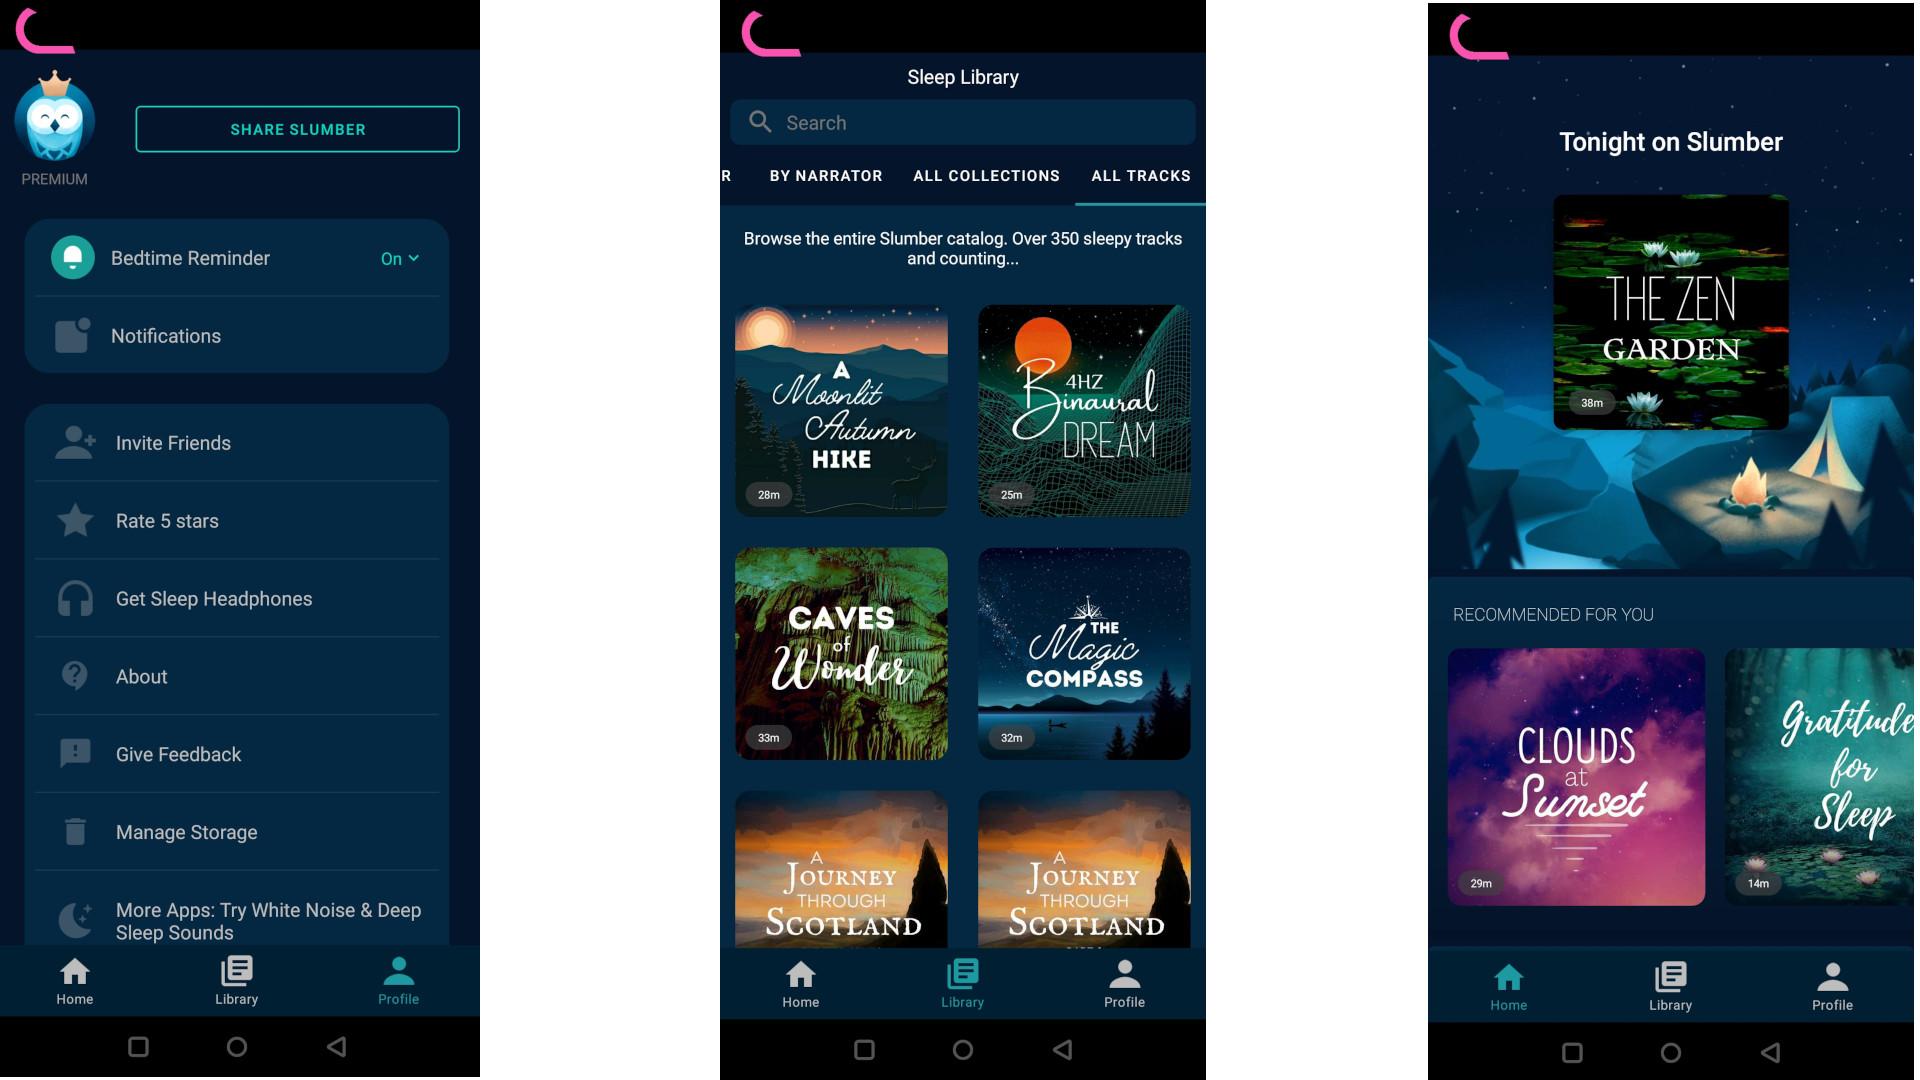 Screengrabs from the Slumber app